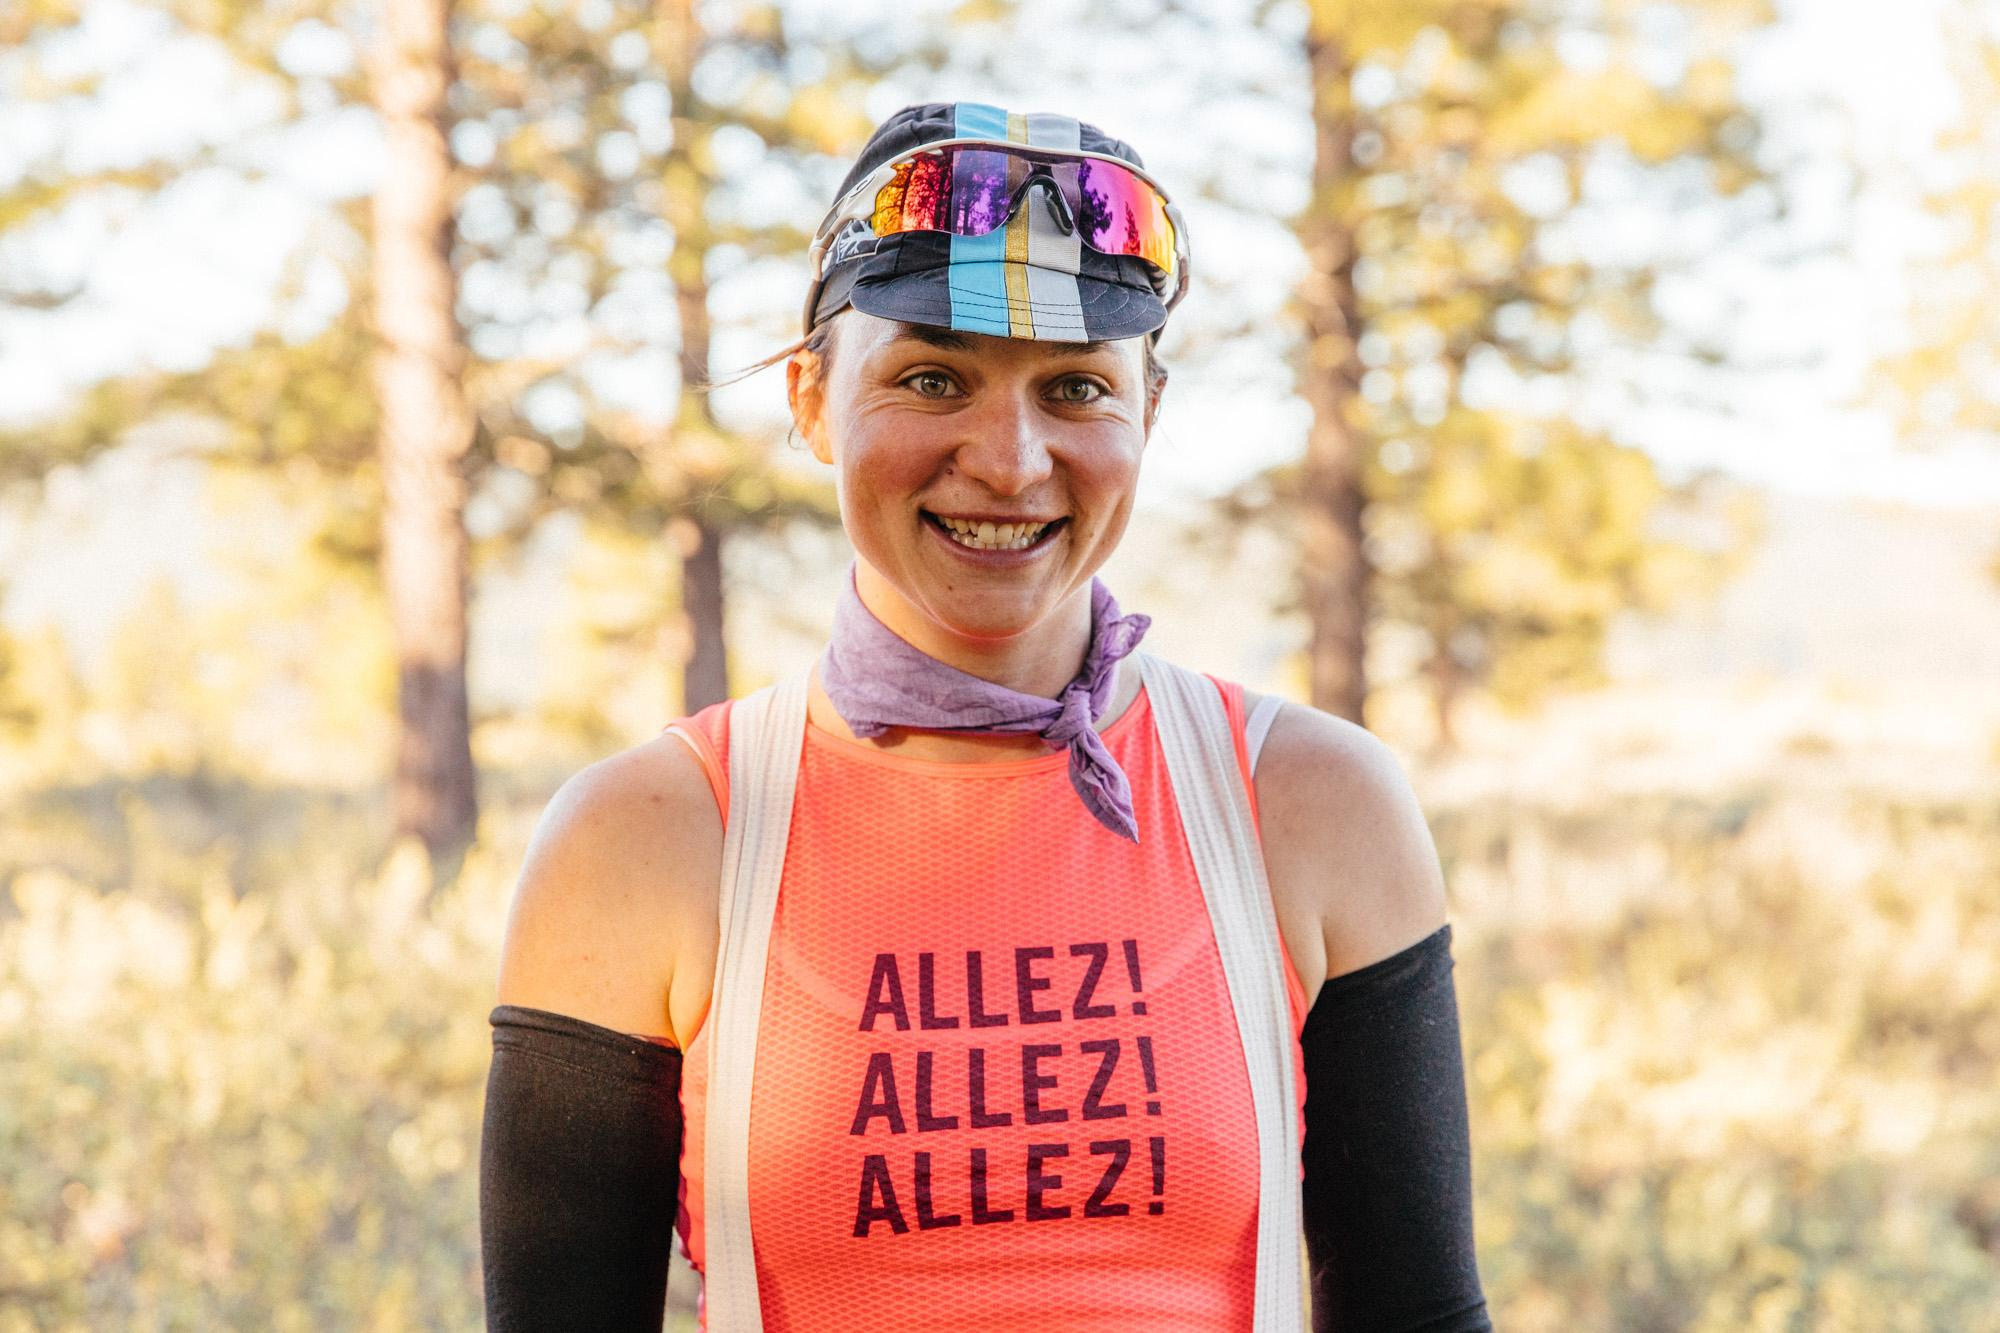 Liz, ready to race 100 miles!